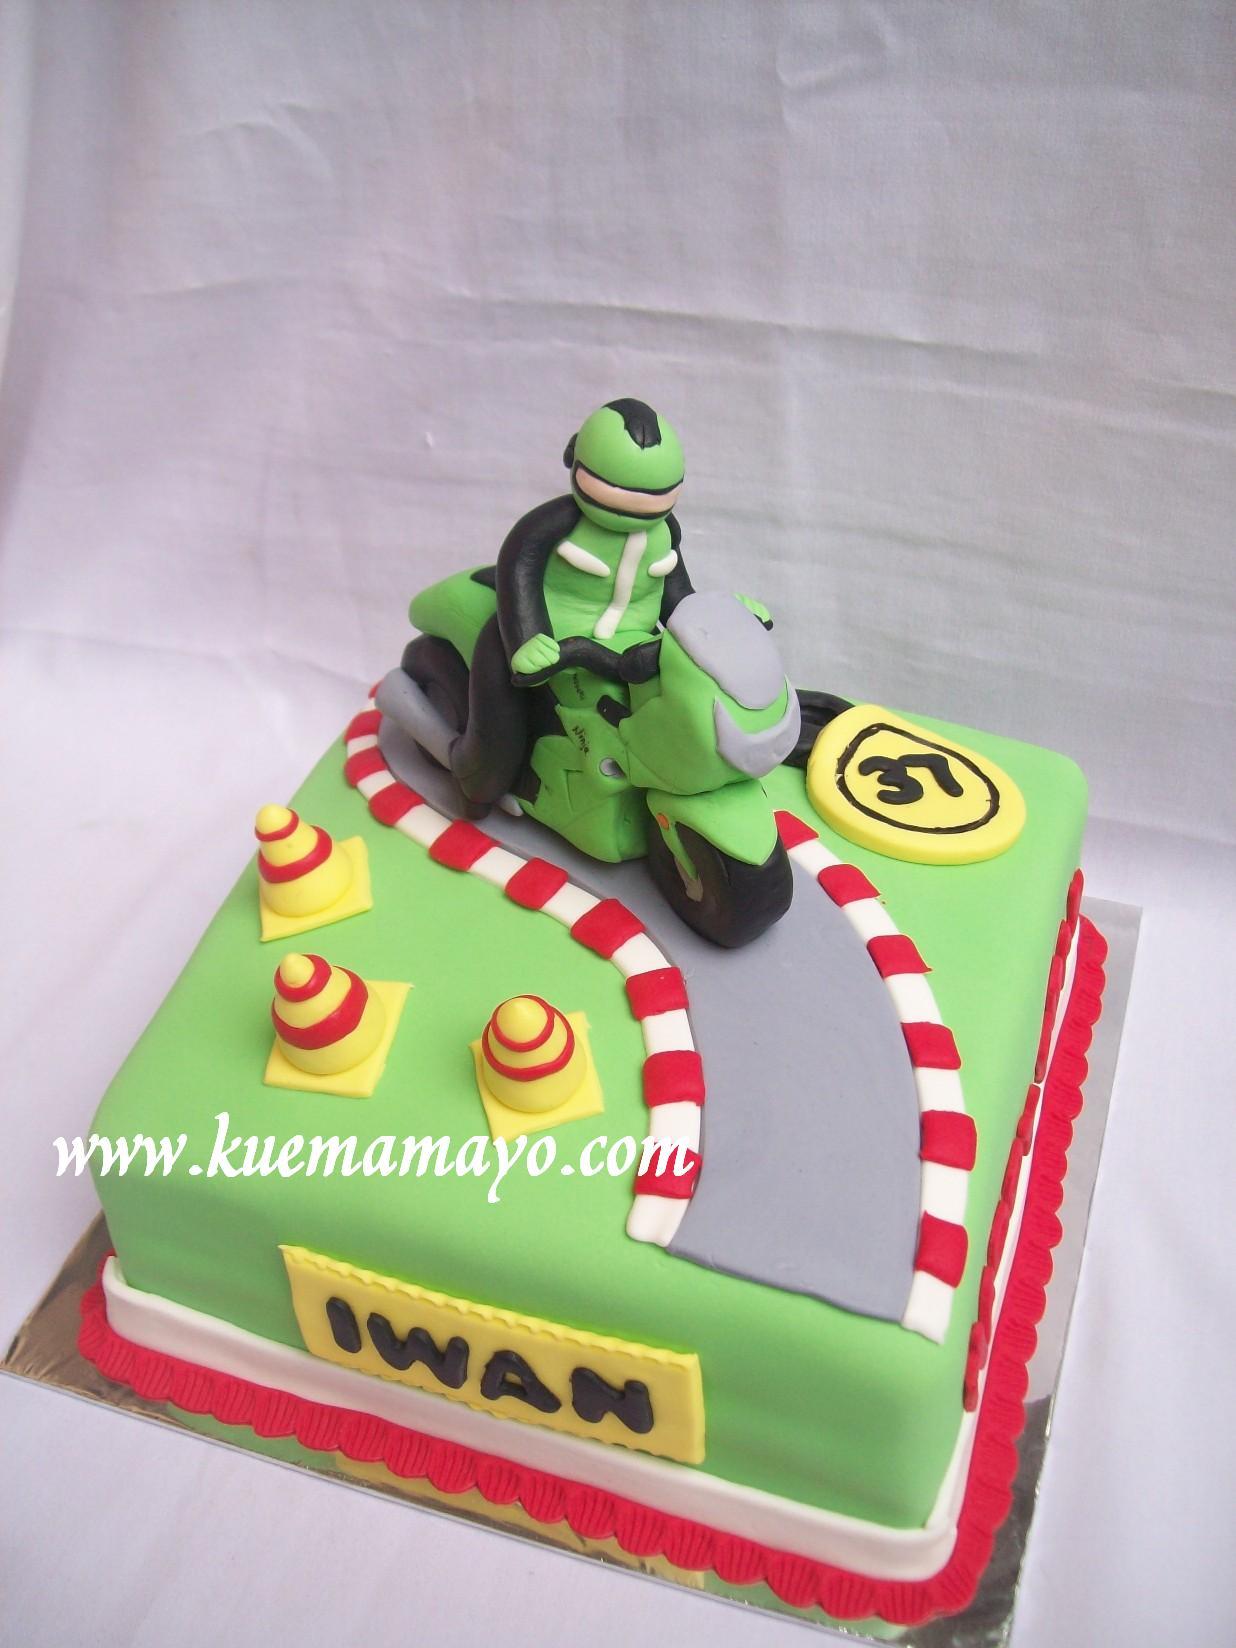 Download Kumpulan 100 Kue Ulang Tahun Gambar Motor Ninja